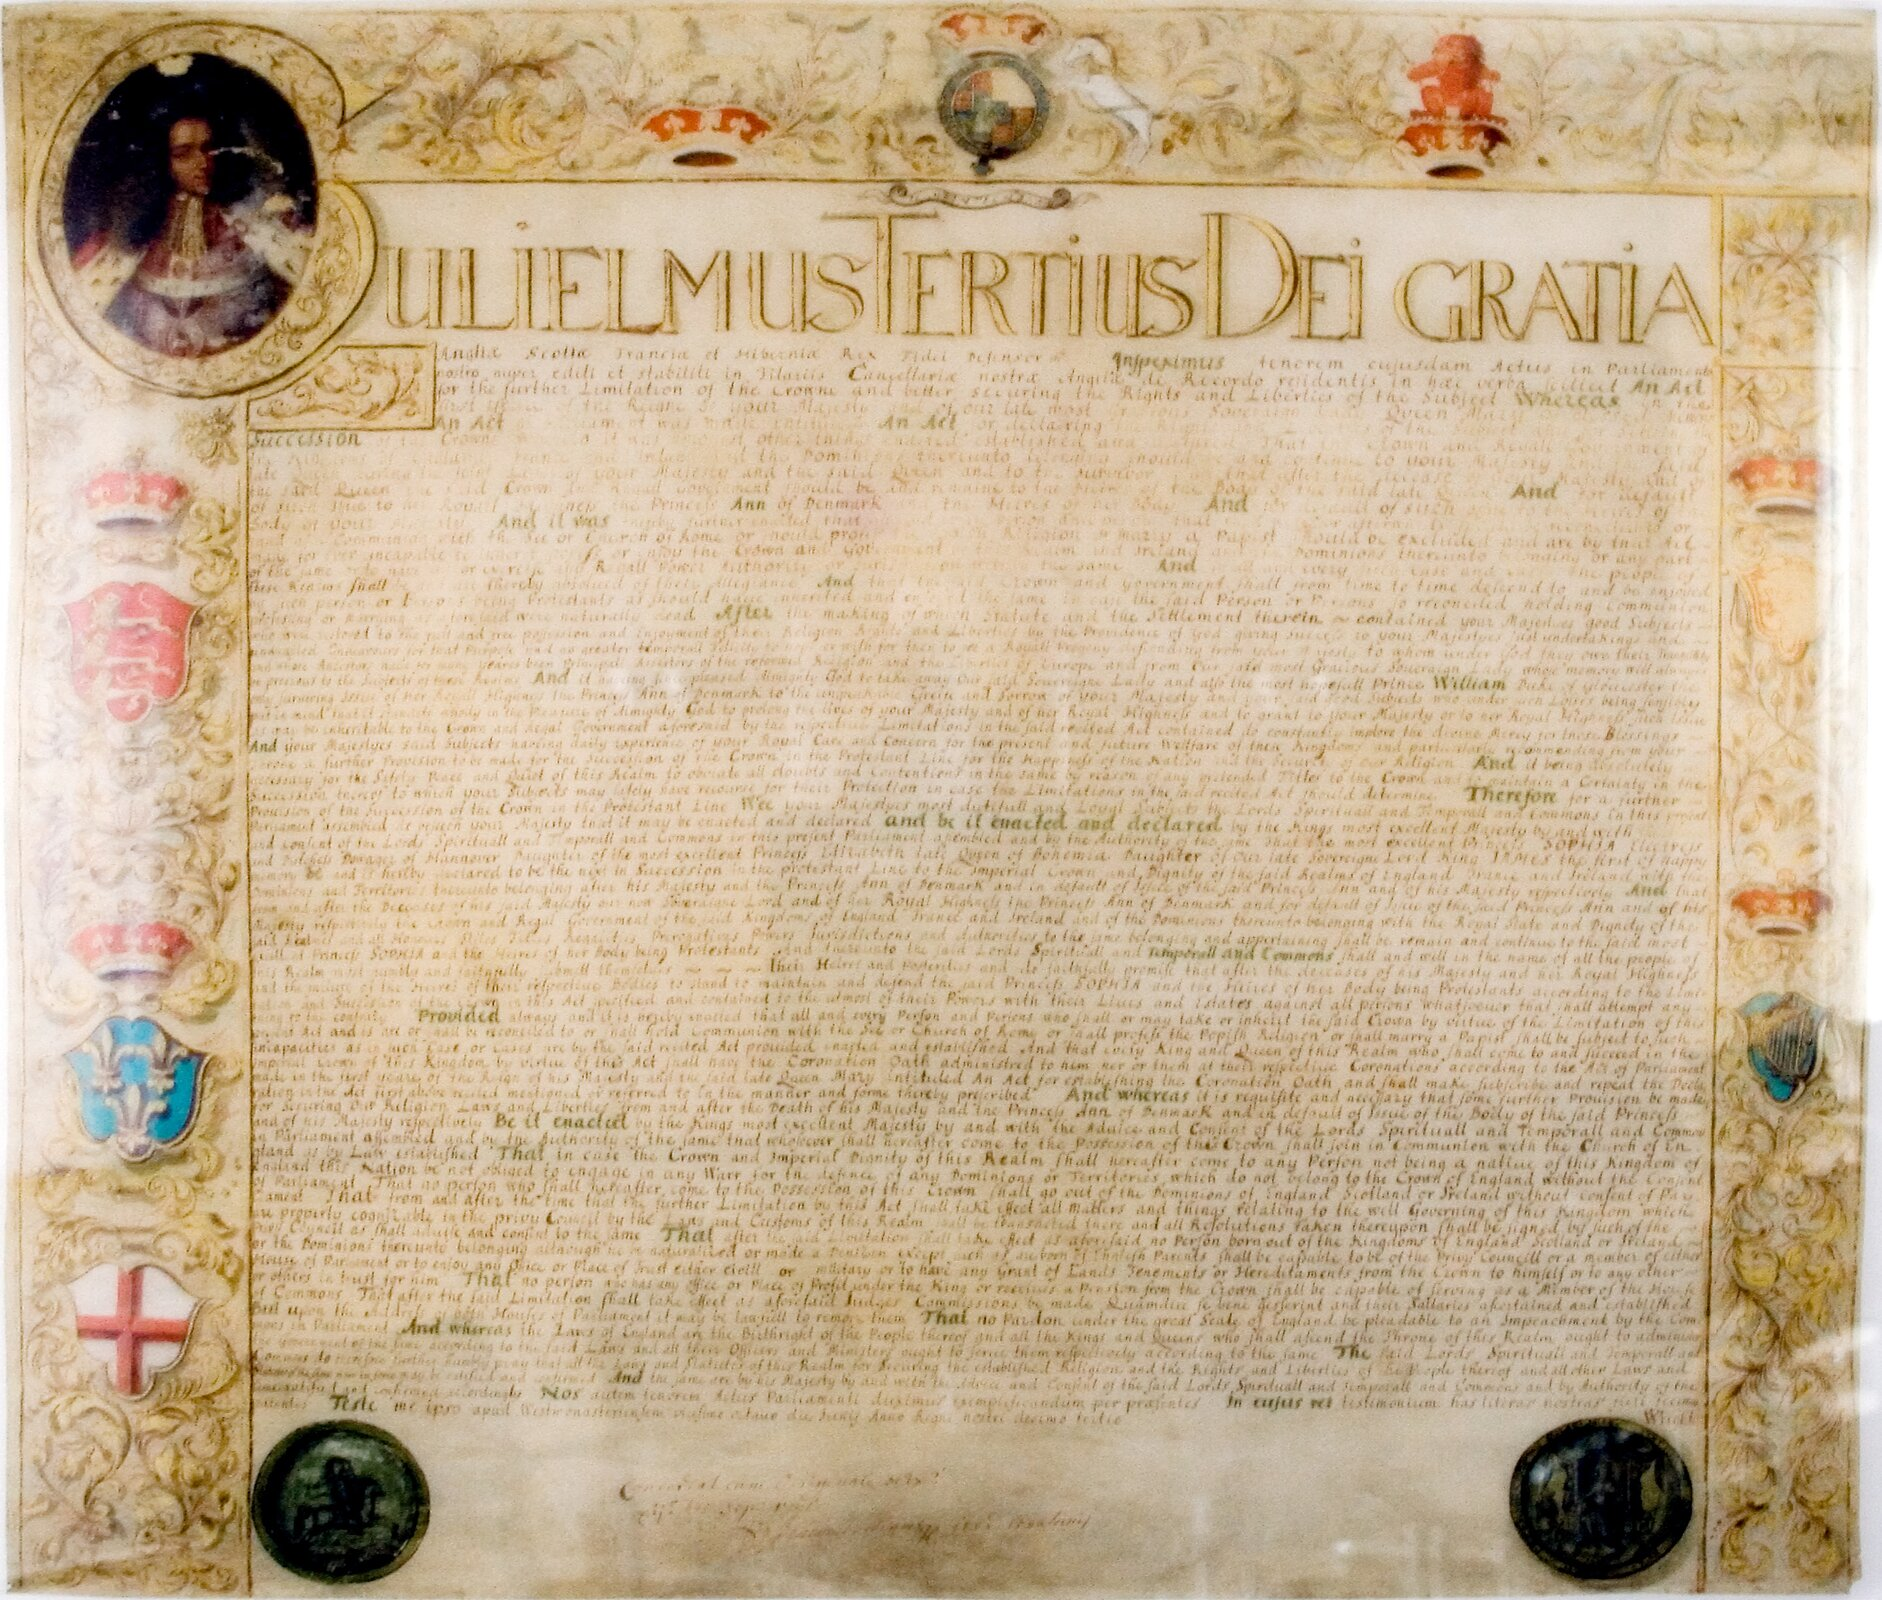 Act of settlement 1701 - oryginał przekazany do Hanoweru. Act of settlement 1701 - oryginał przekazany do Hanoweru. Źródło: Torsten Bätge, Wikimedia Commons, licencja: CC BY-SA 3.0.